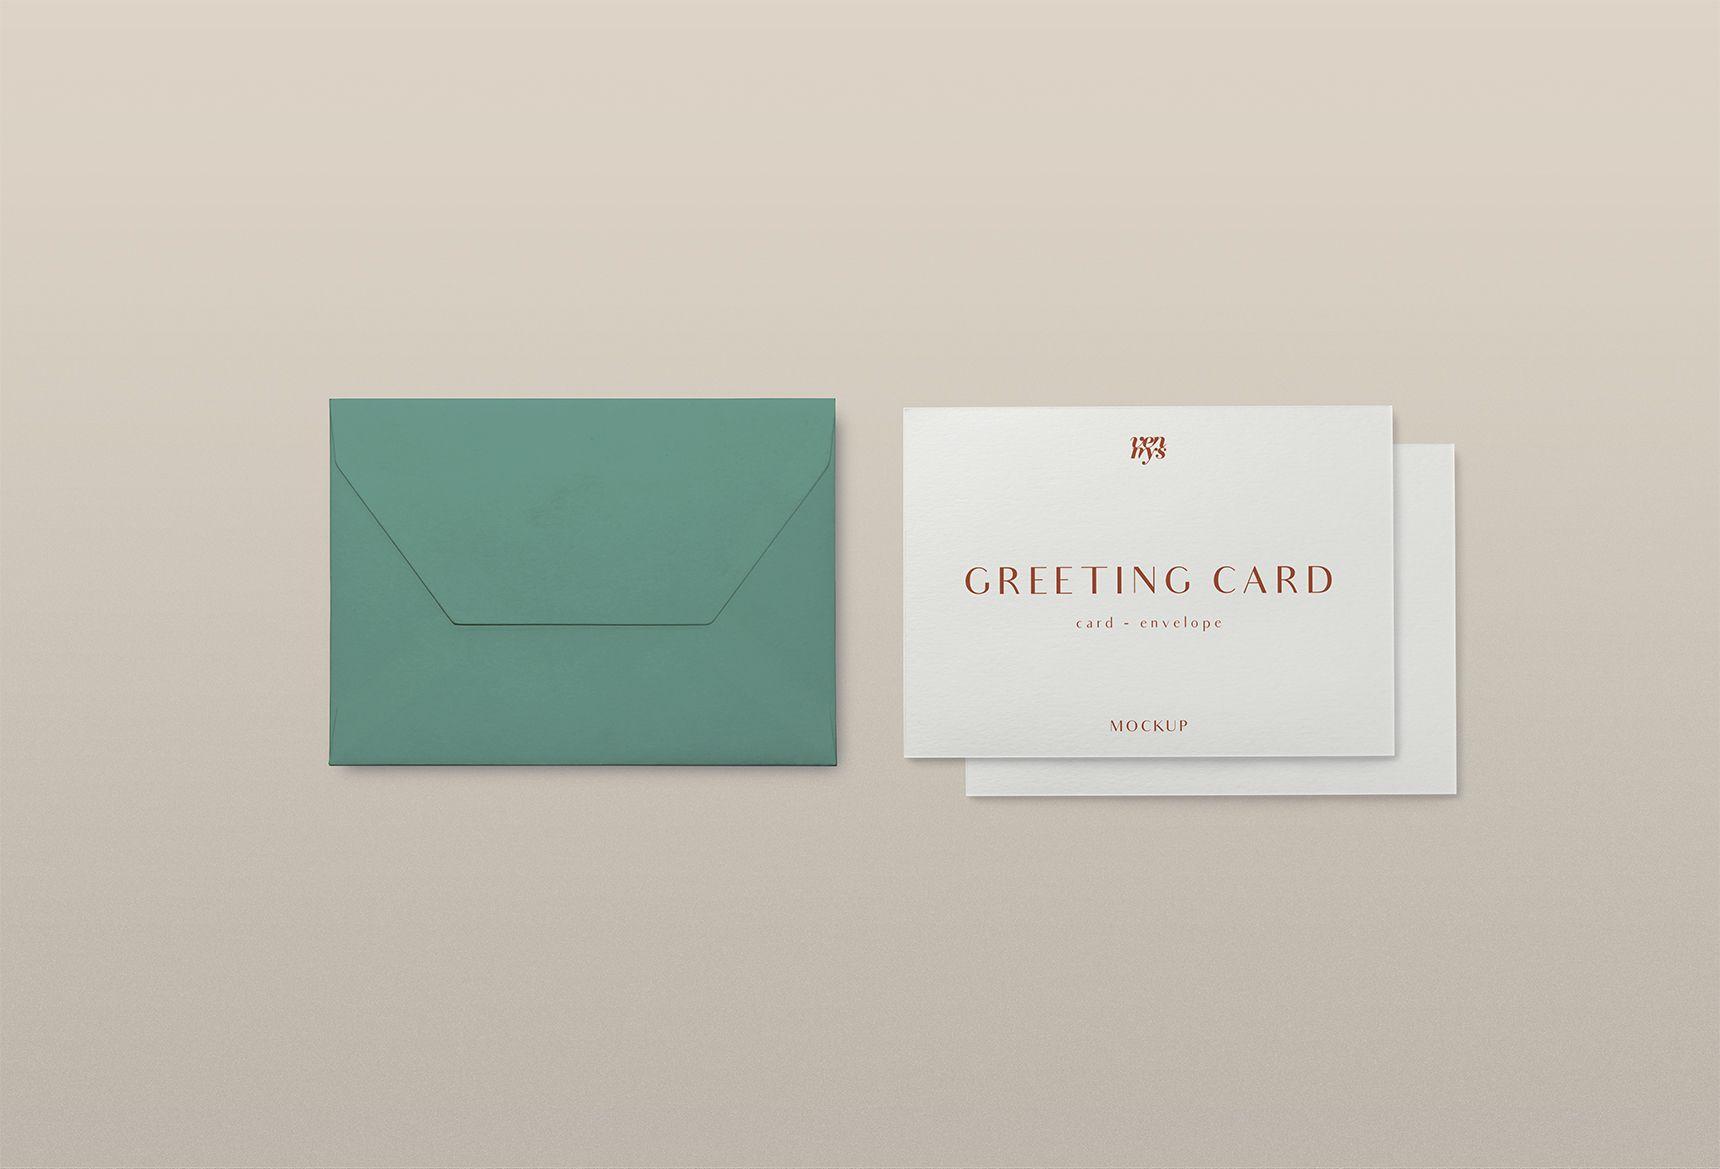 Free Greeting Card Psd Mockup Free Greeting Cards Greeting Cards Greetings